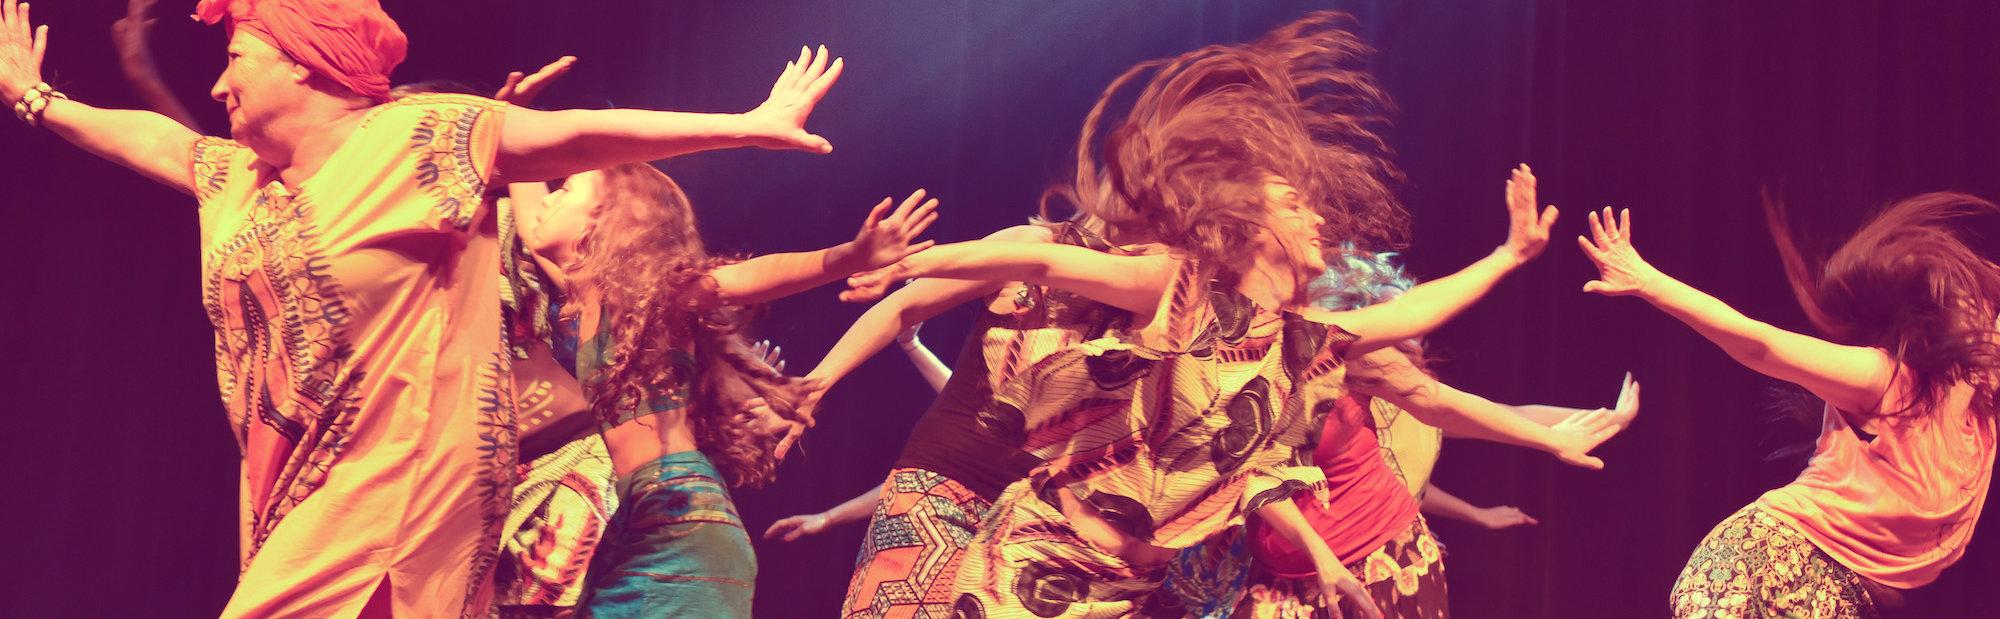 gala-linadanse-14-mai-2016-danse-africaine